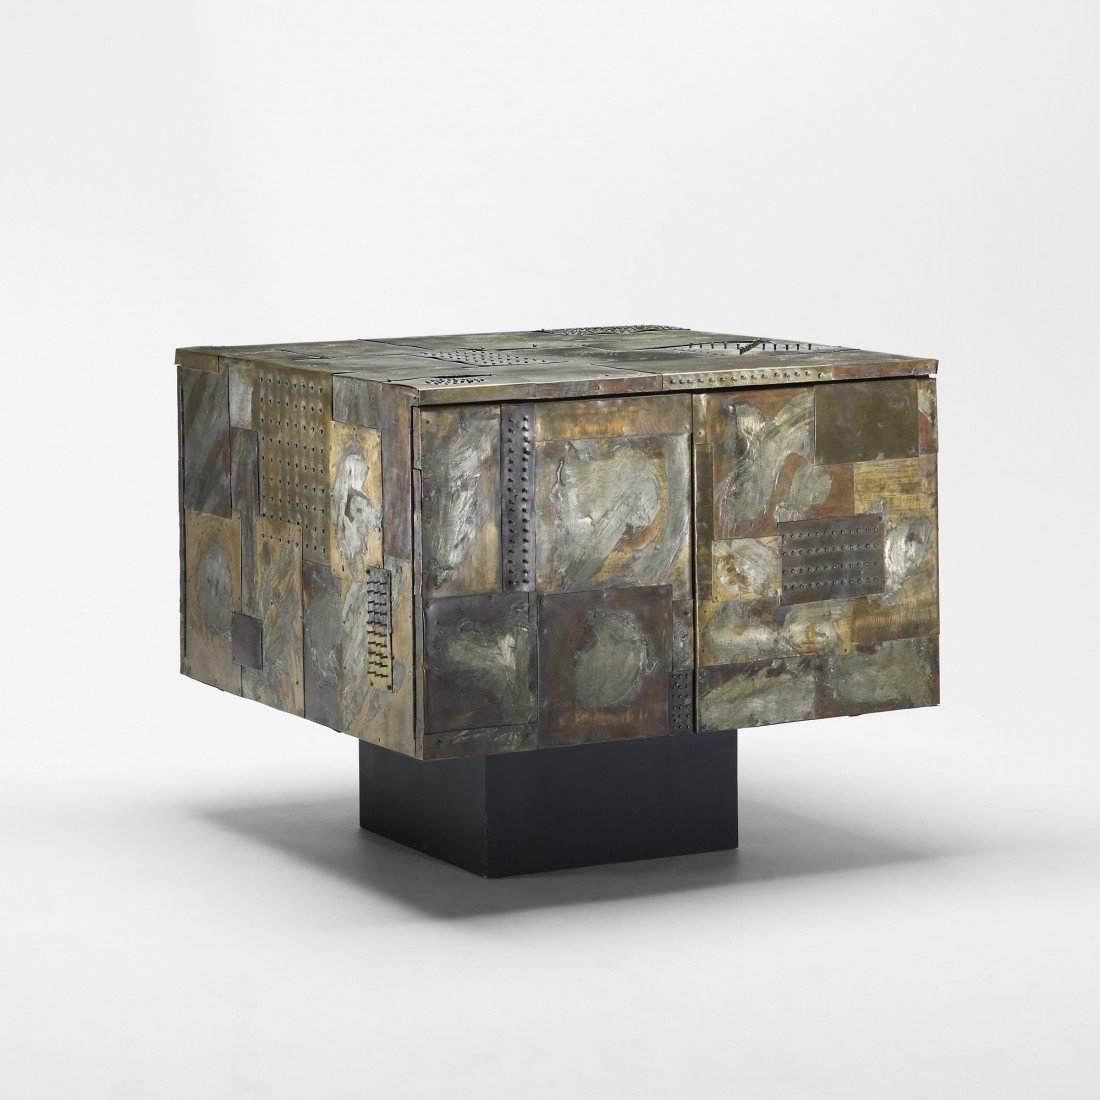 101: Paul Evans cabinet, model PE 32